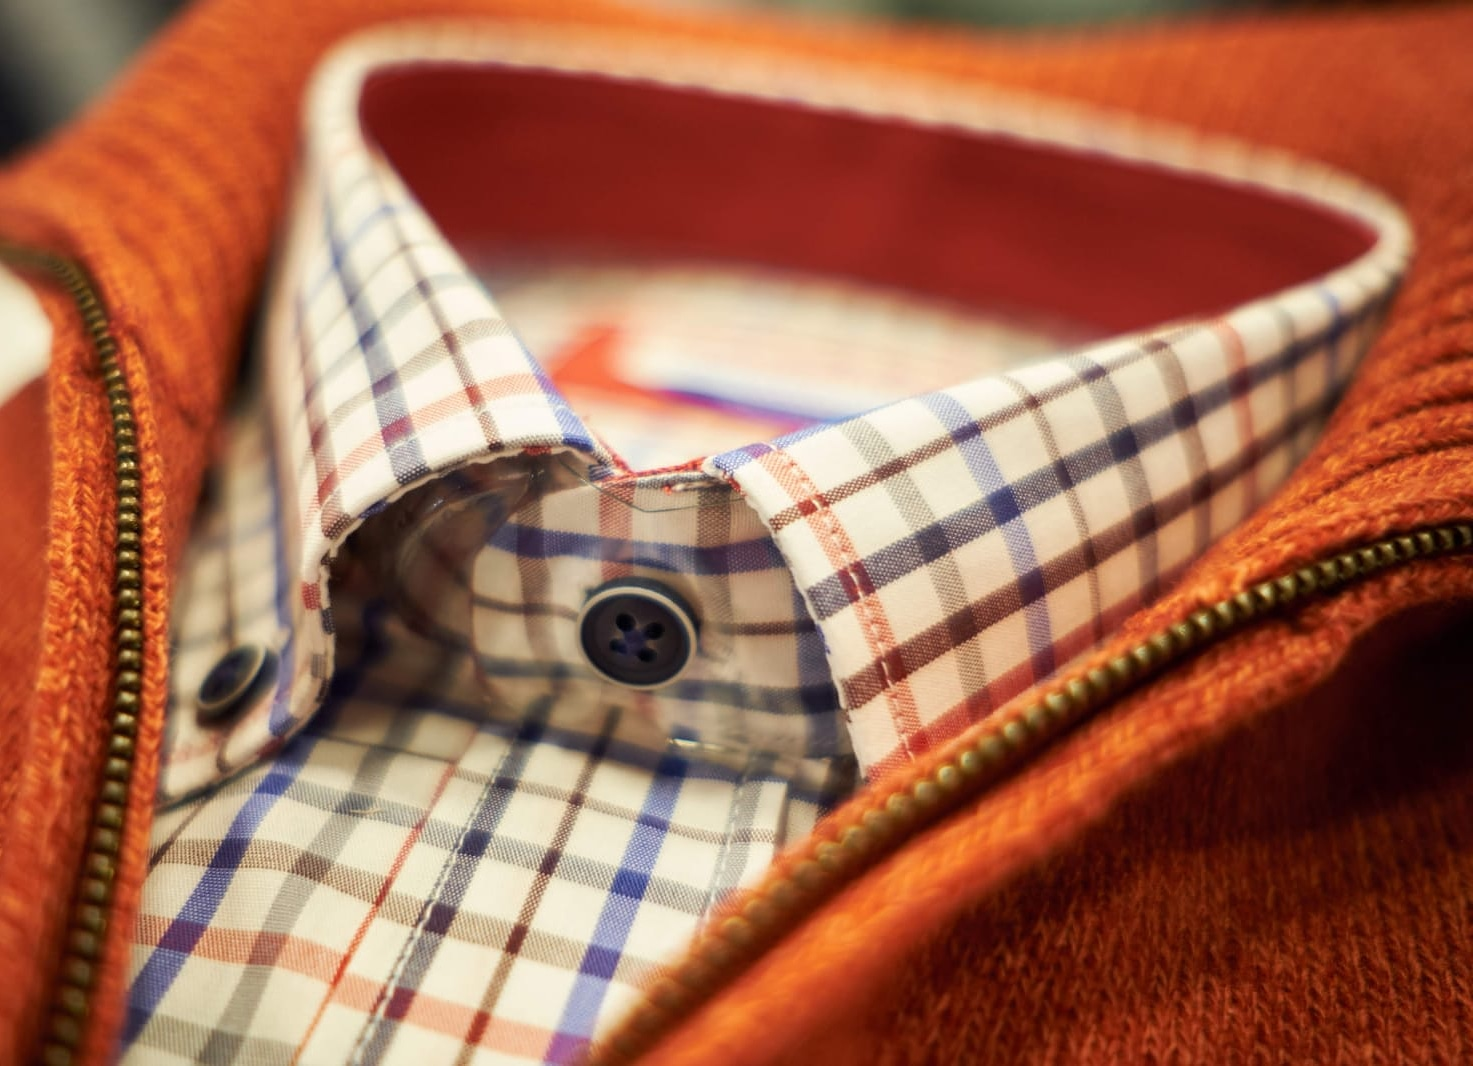 http://executiveand.com/col%C2%B7leccio-roba-dhome-hivern-2018-2019-executiveand-tienda-de-ropa-esport-y-de-vestir-para-caballeros-vester-pour-hommes